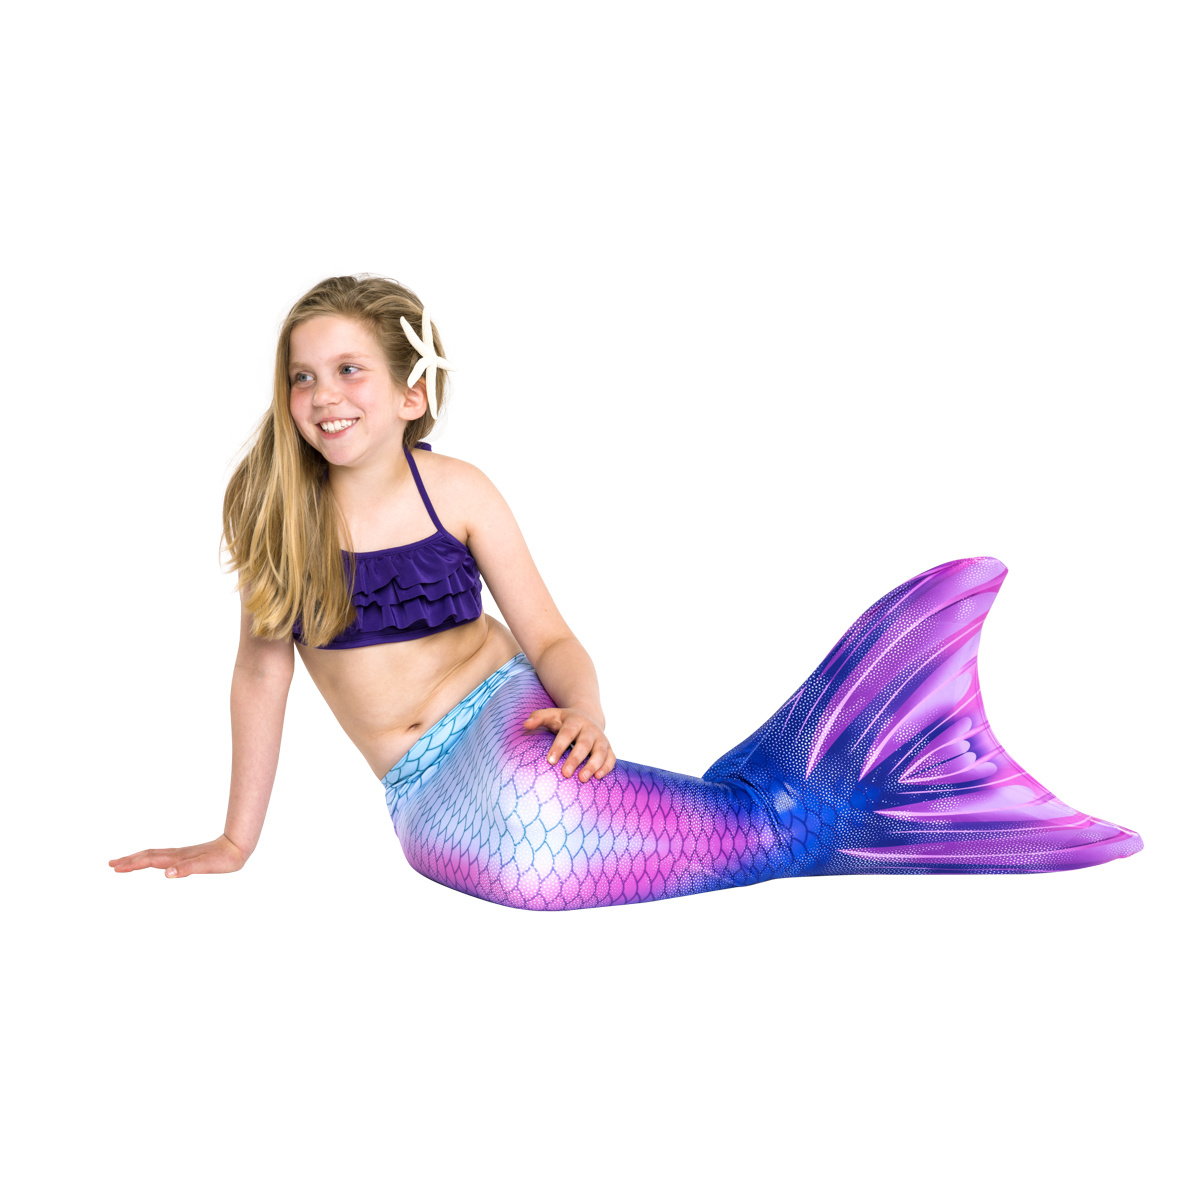 NoordZeemeermin Purplelee Bikini